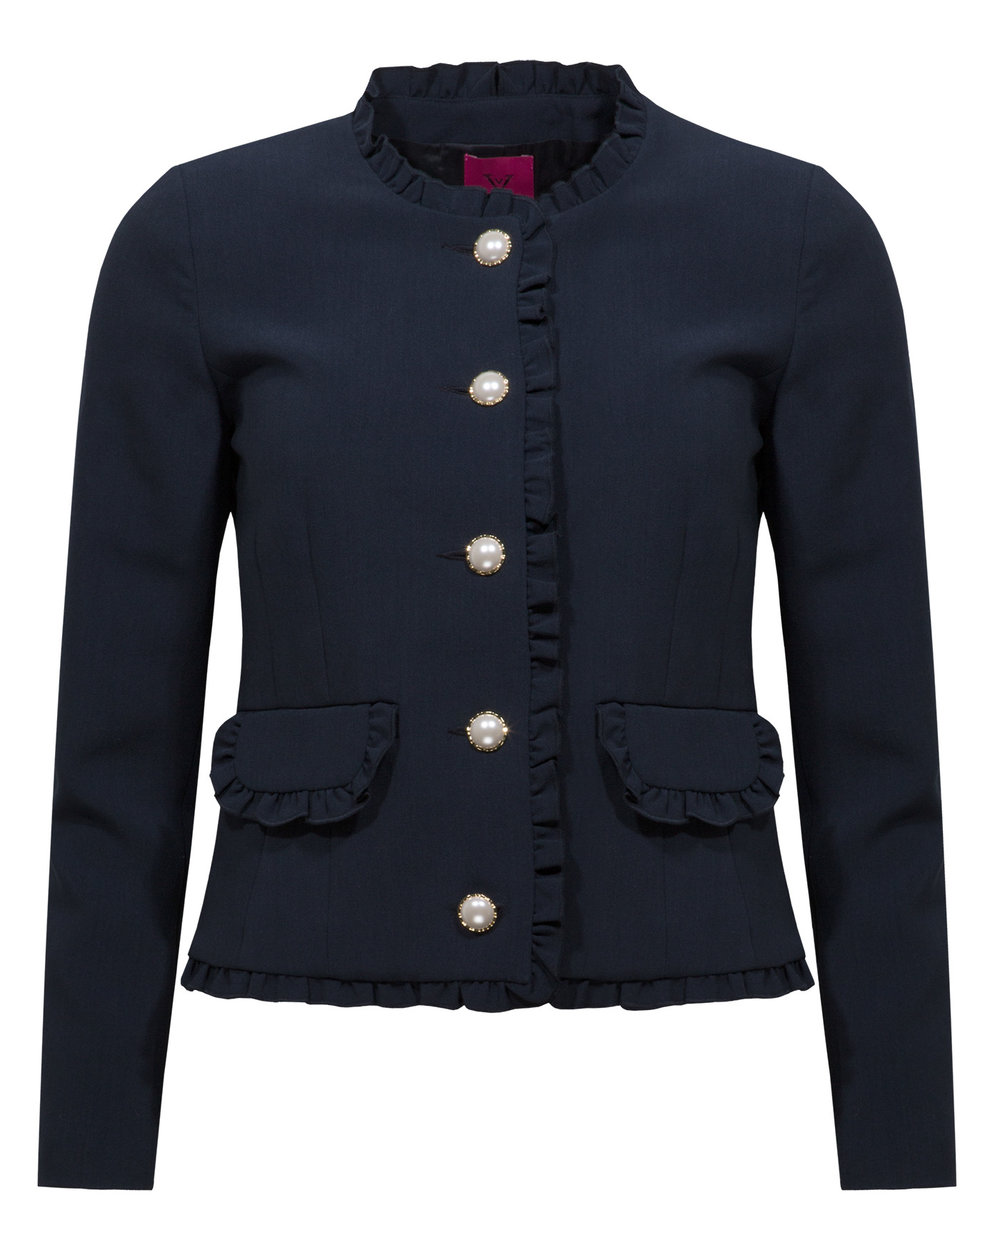 Rosie-jacket-navy-blue.jpg